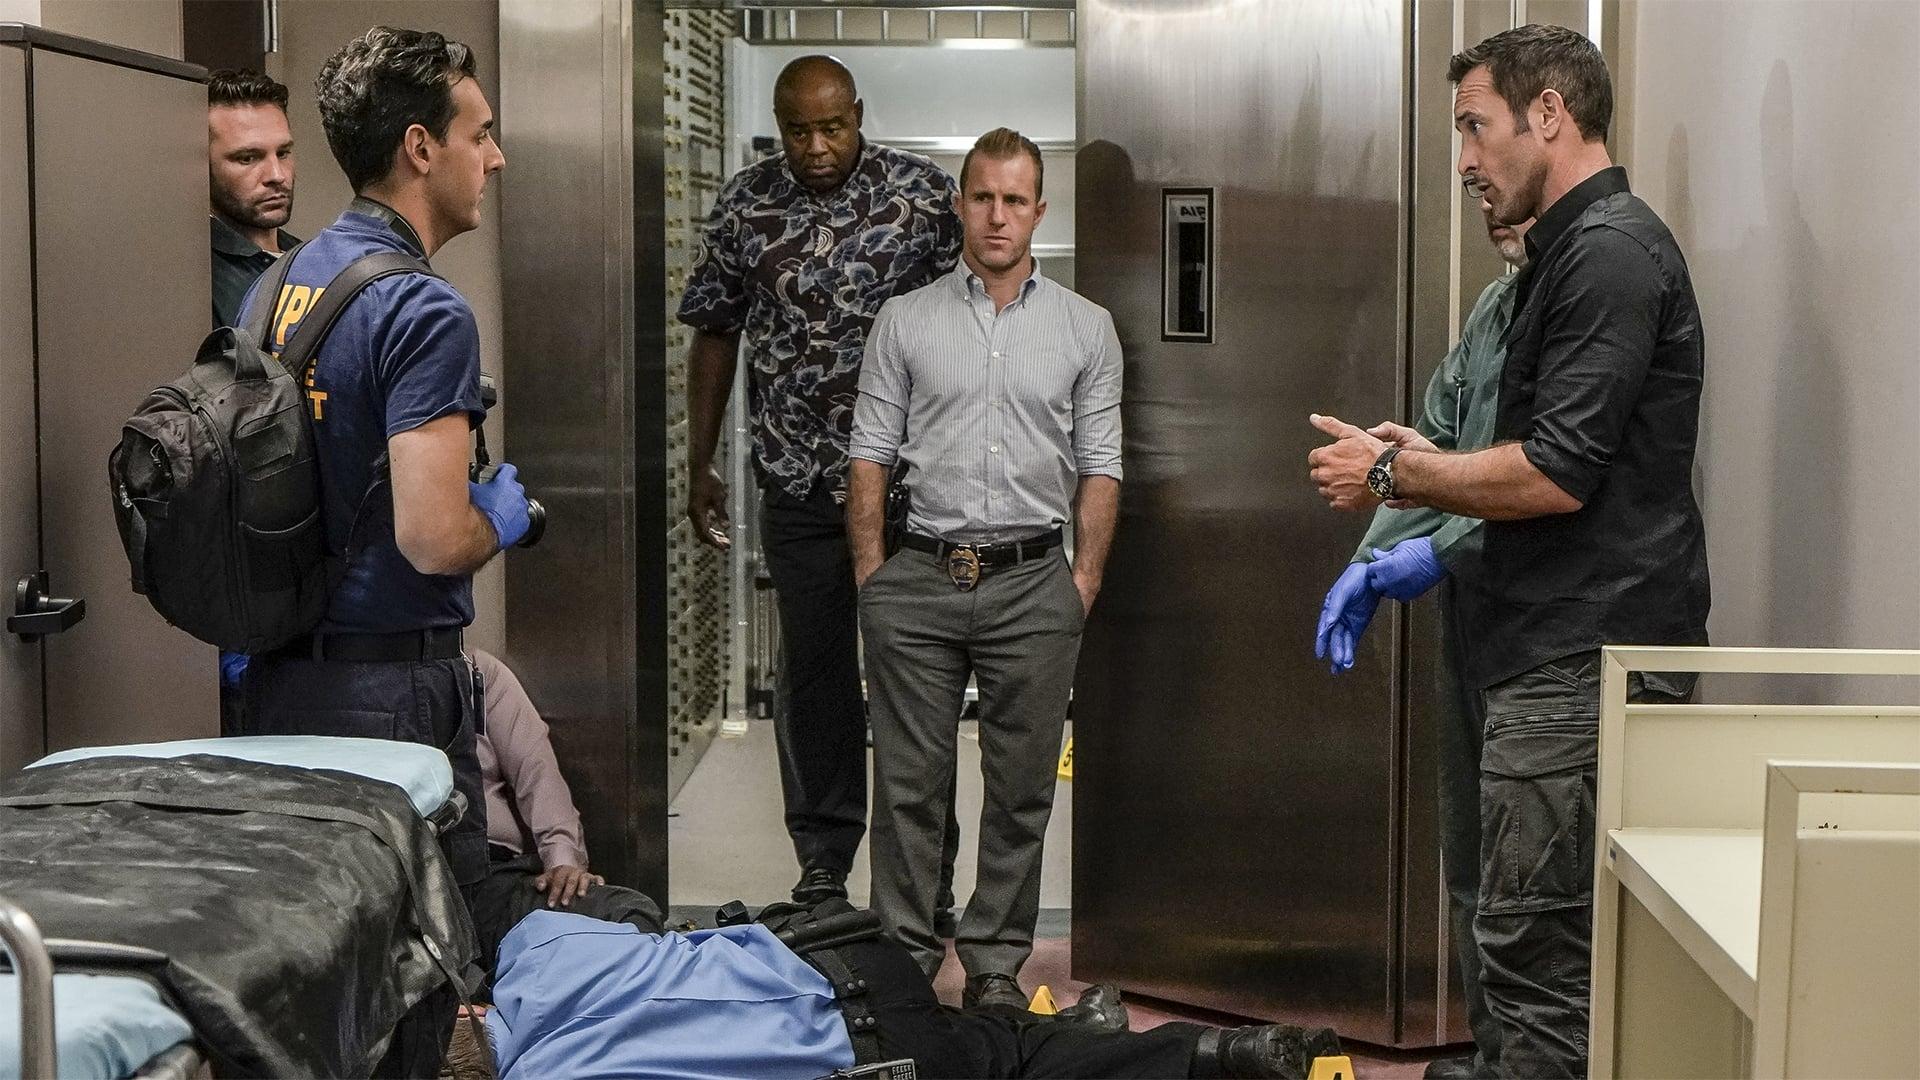 Hawaii Five-0 - Season 9 Episode 17 : E'ao lu'au a kualima (Offer Young Taro Leaves To)